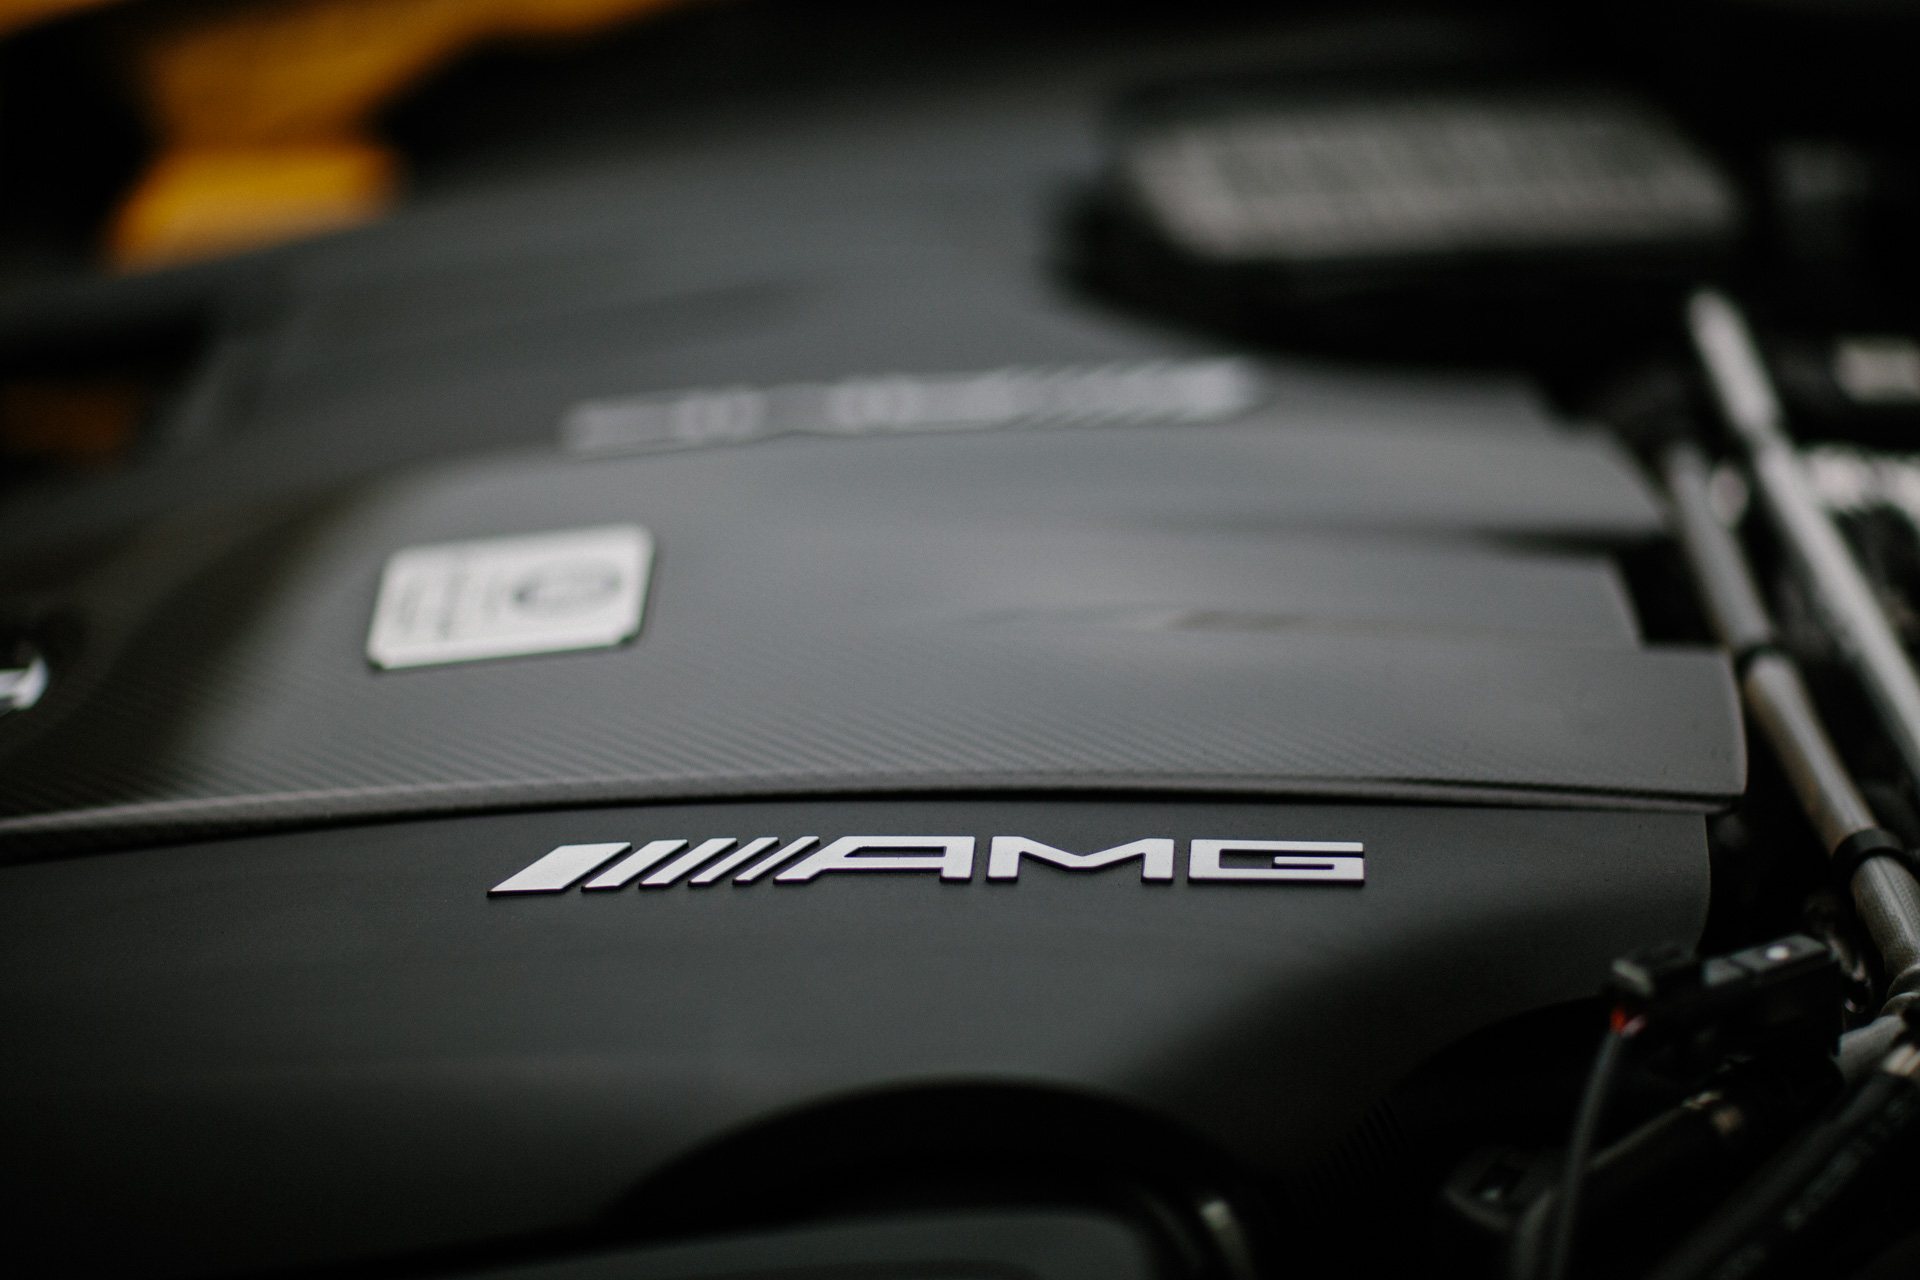 Mercedes_Benz_AMG_2017_Edits (23 of 23).jpg